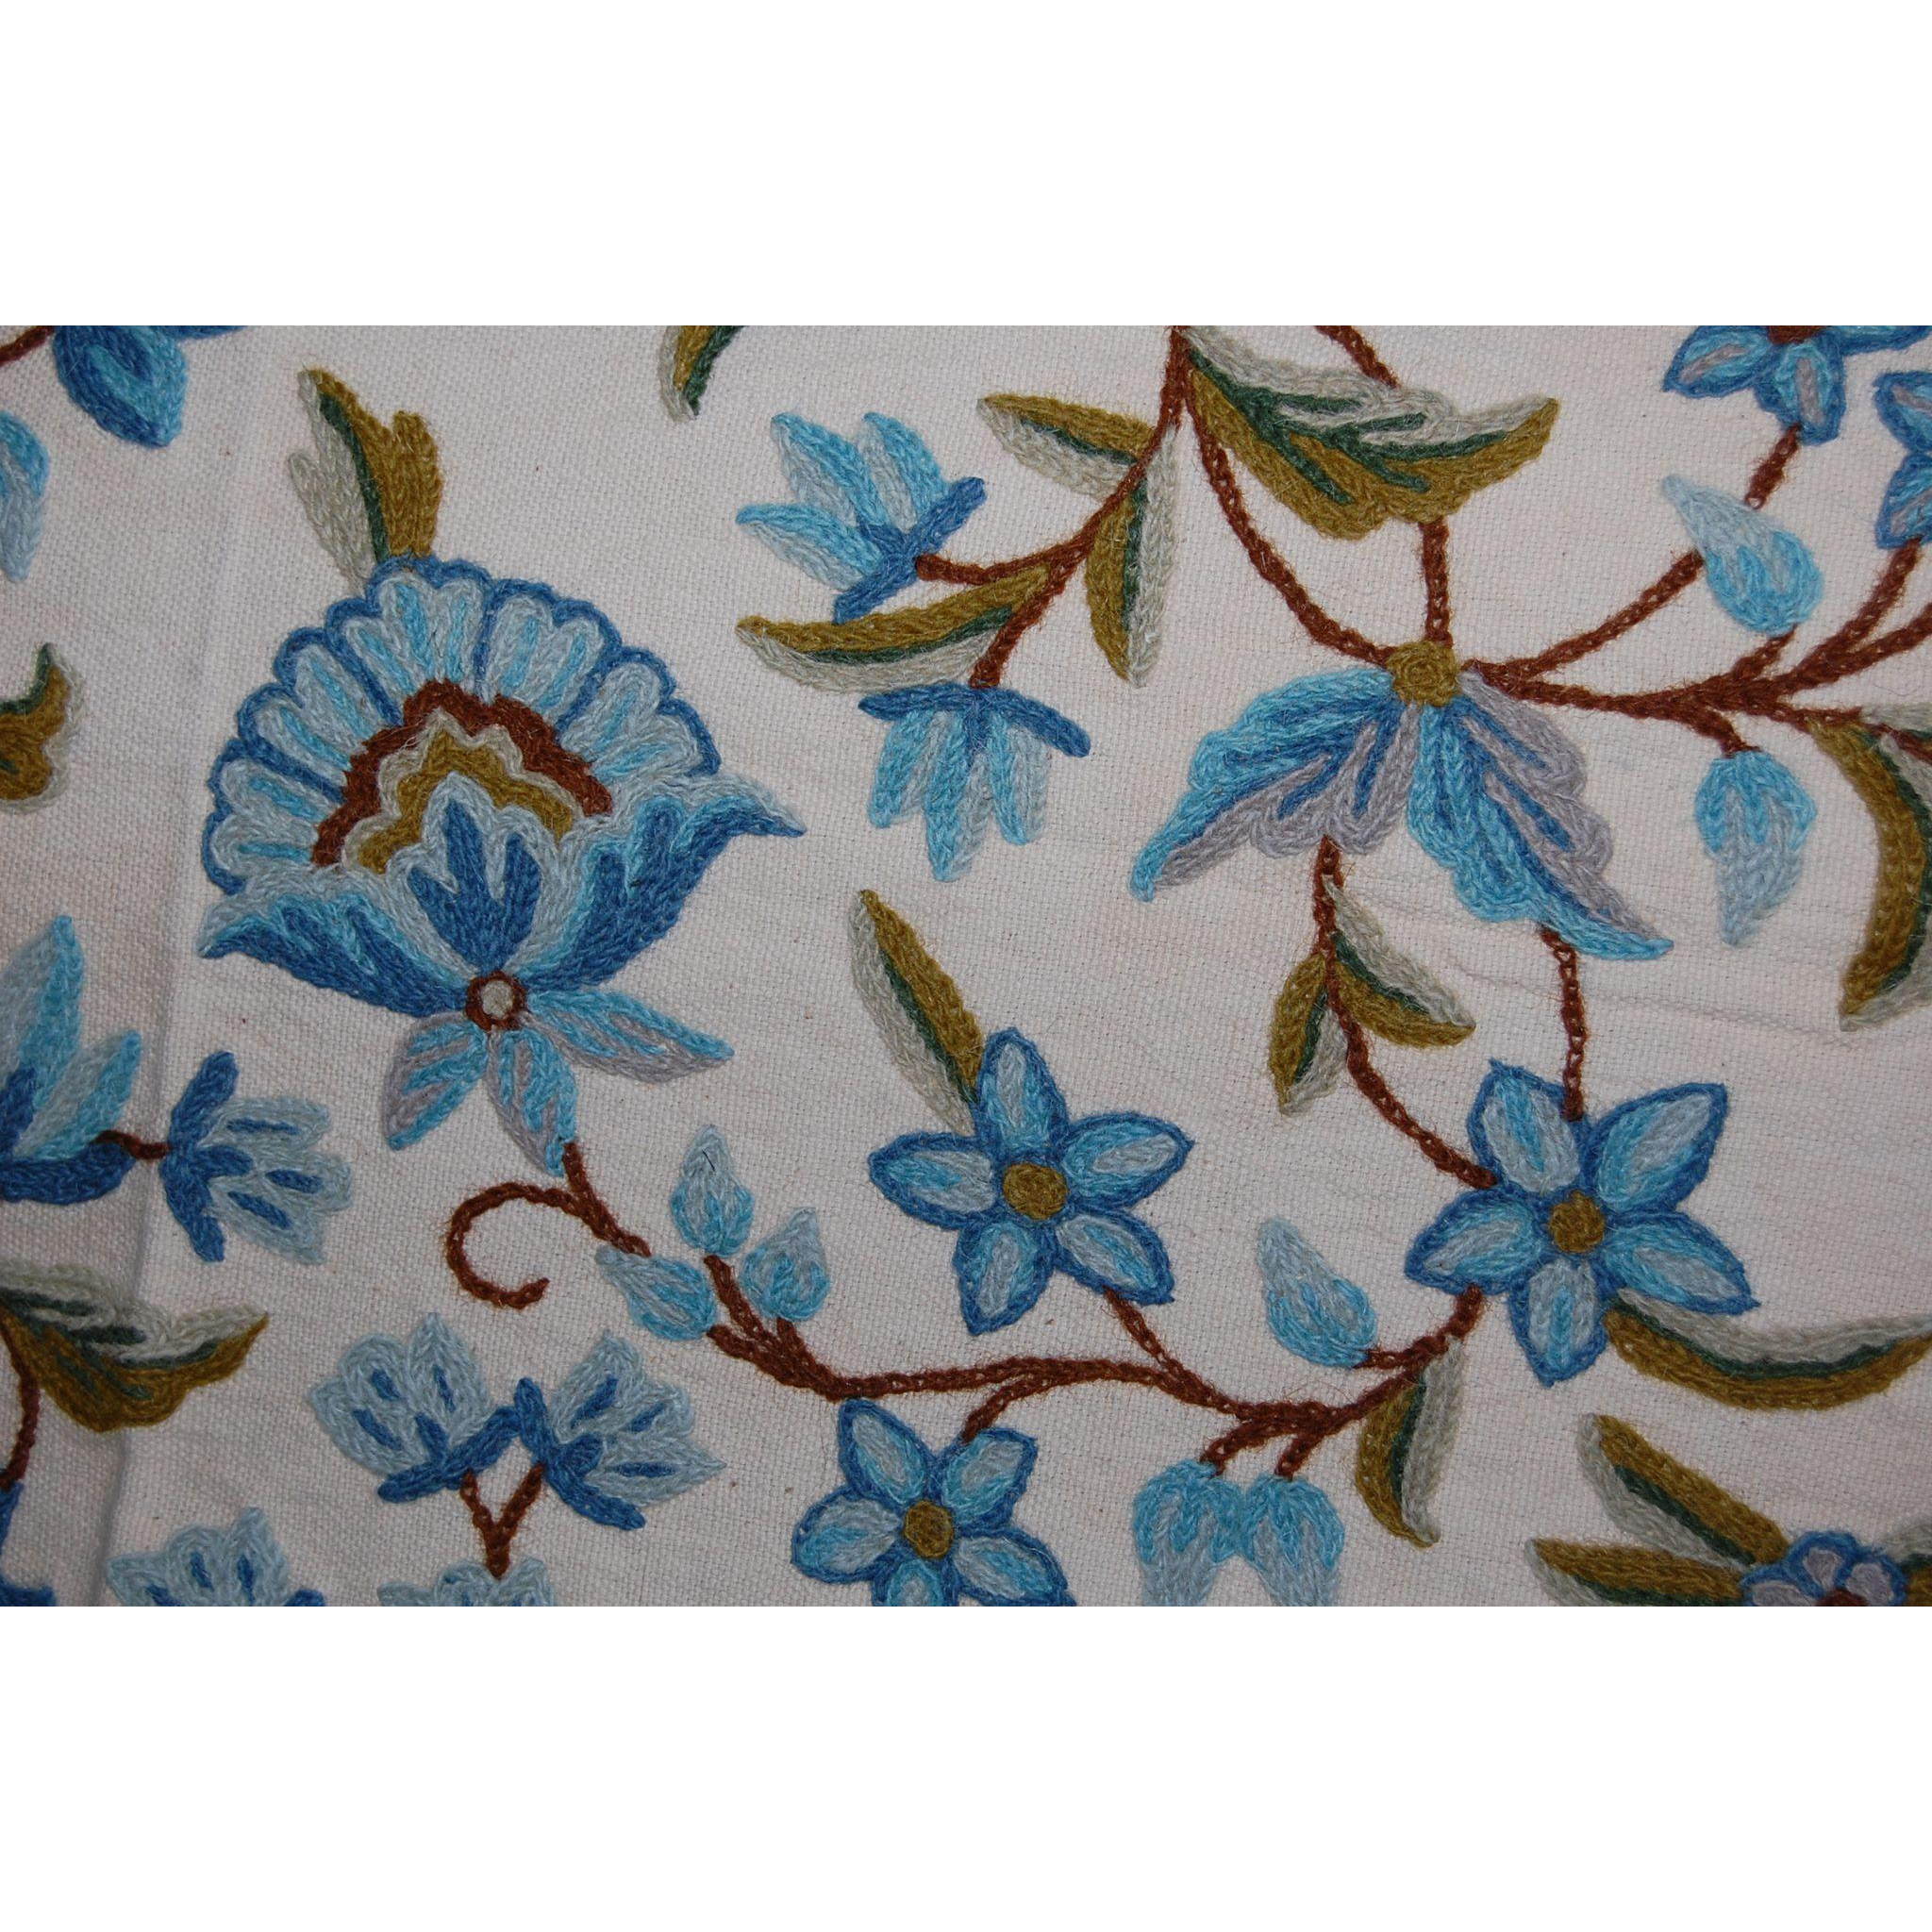 Vintage Wool Fabric 96